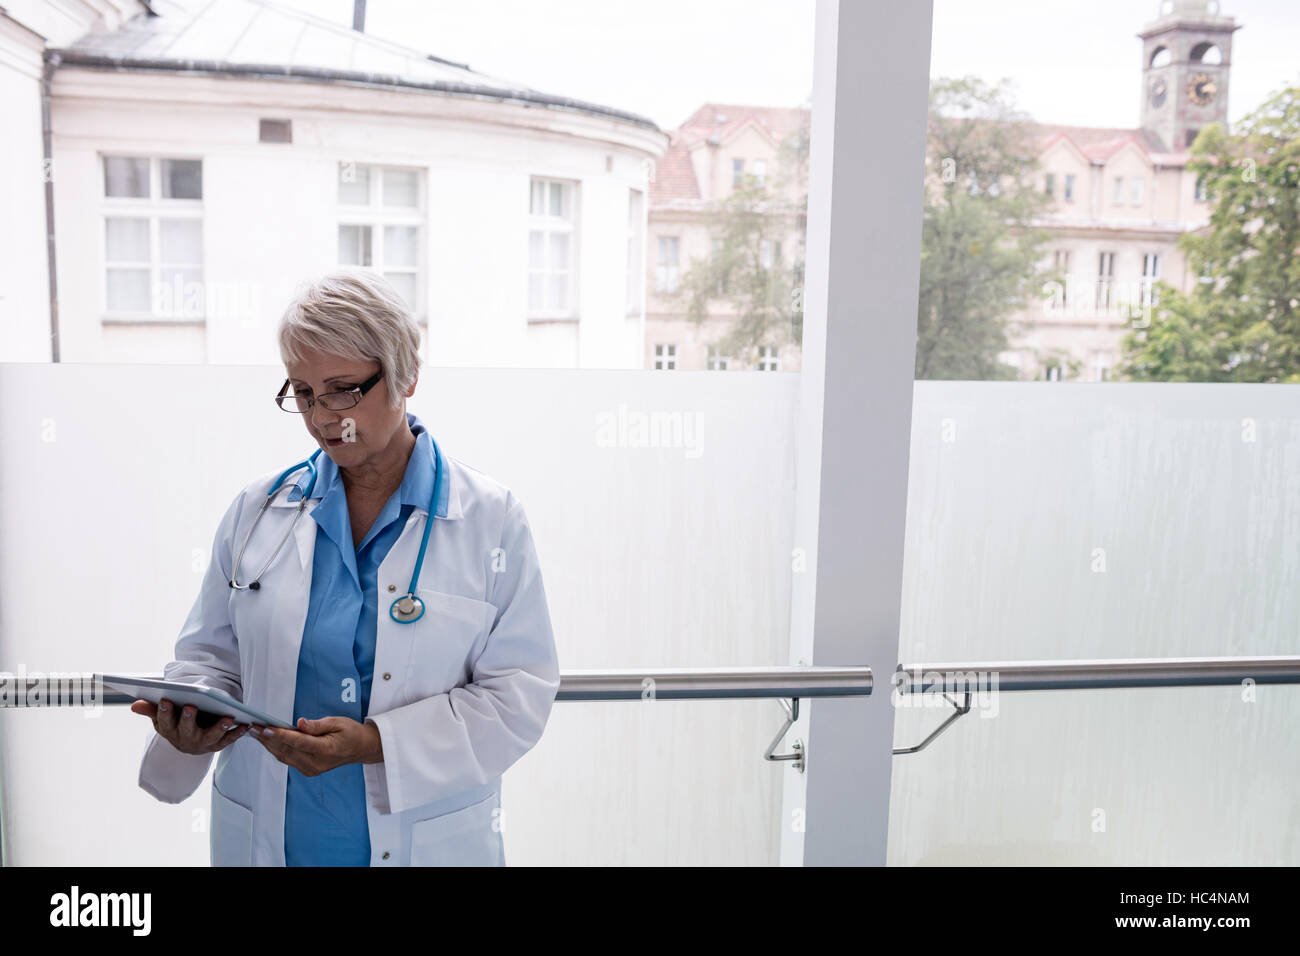 Doctor using digital tablet in corridor Banque D'Images